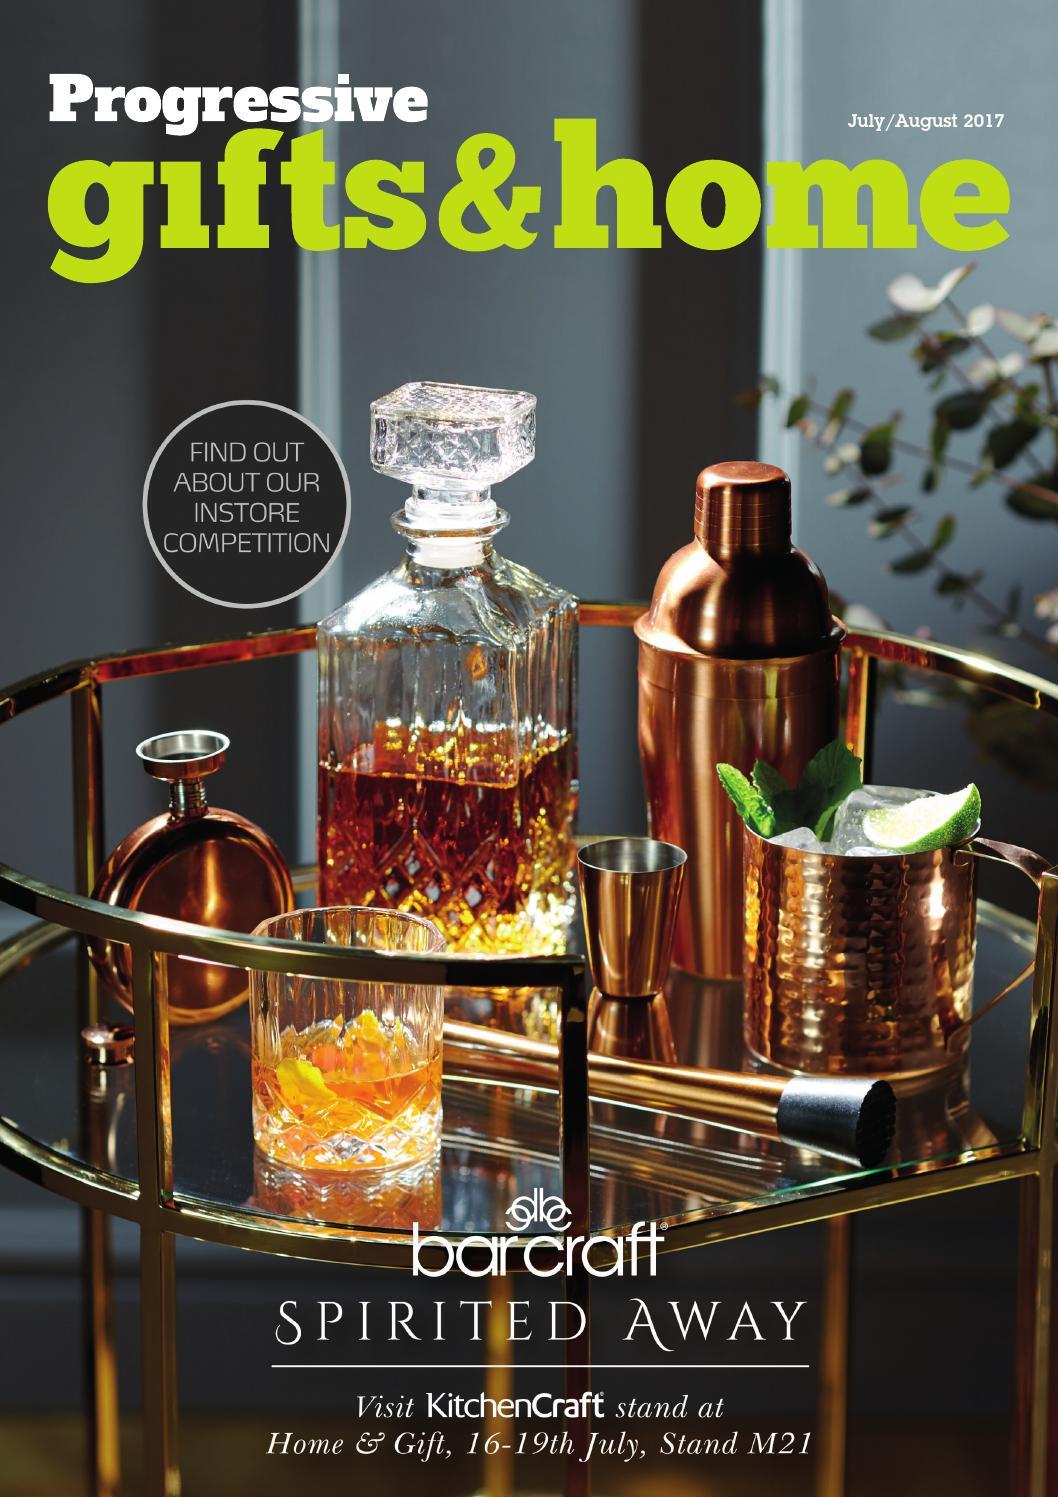 Contemporary Decor for the Home Transomnia Wild Meadow Round Bowl Decorative Floral Design Dish Wonderful Gift Idea